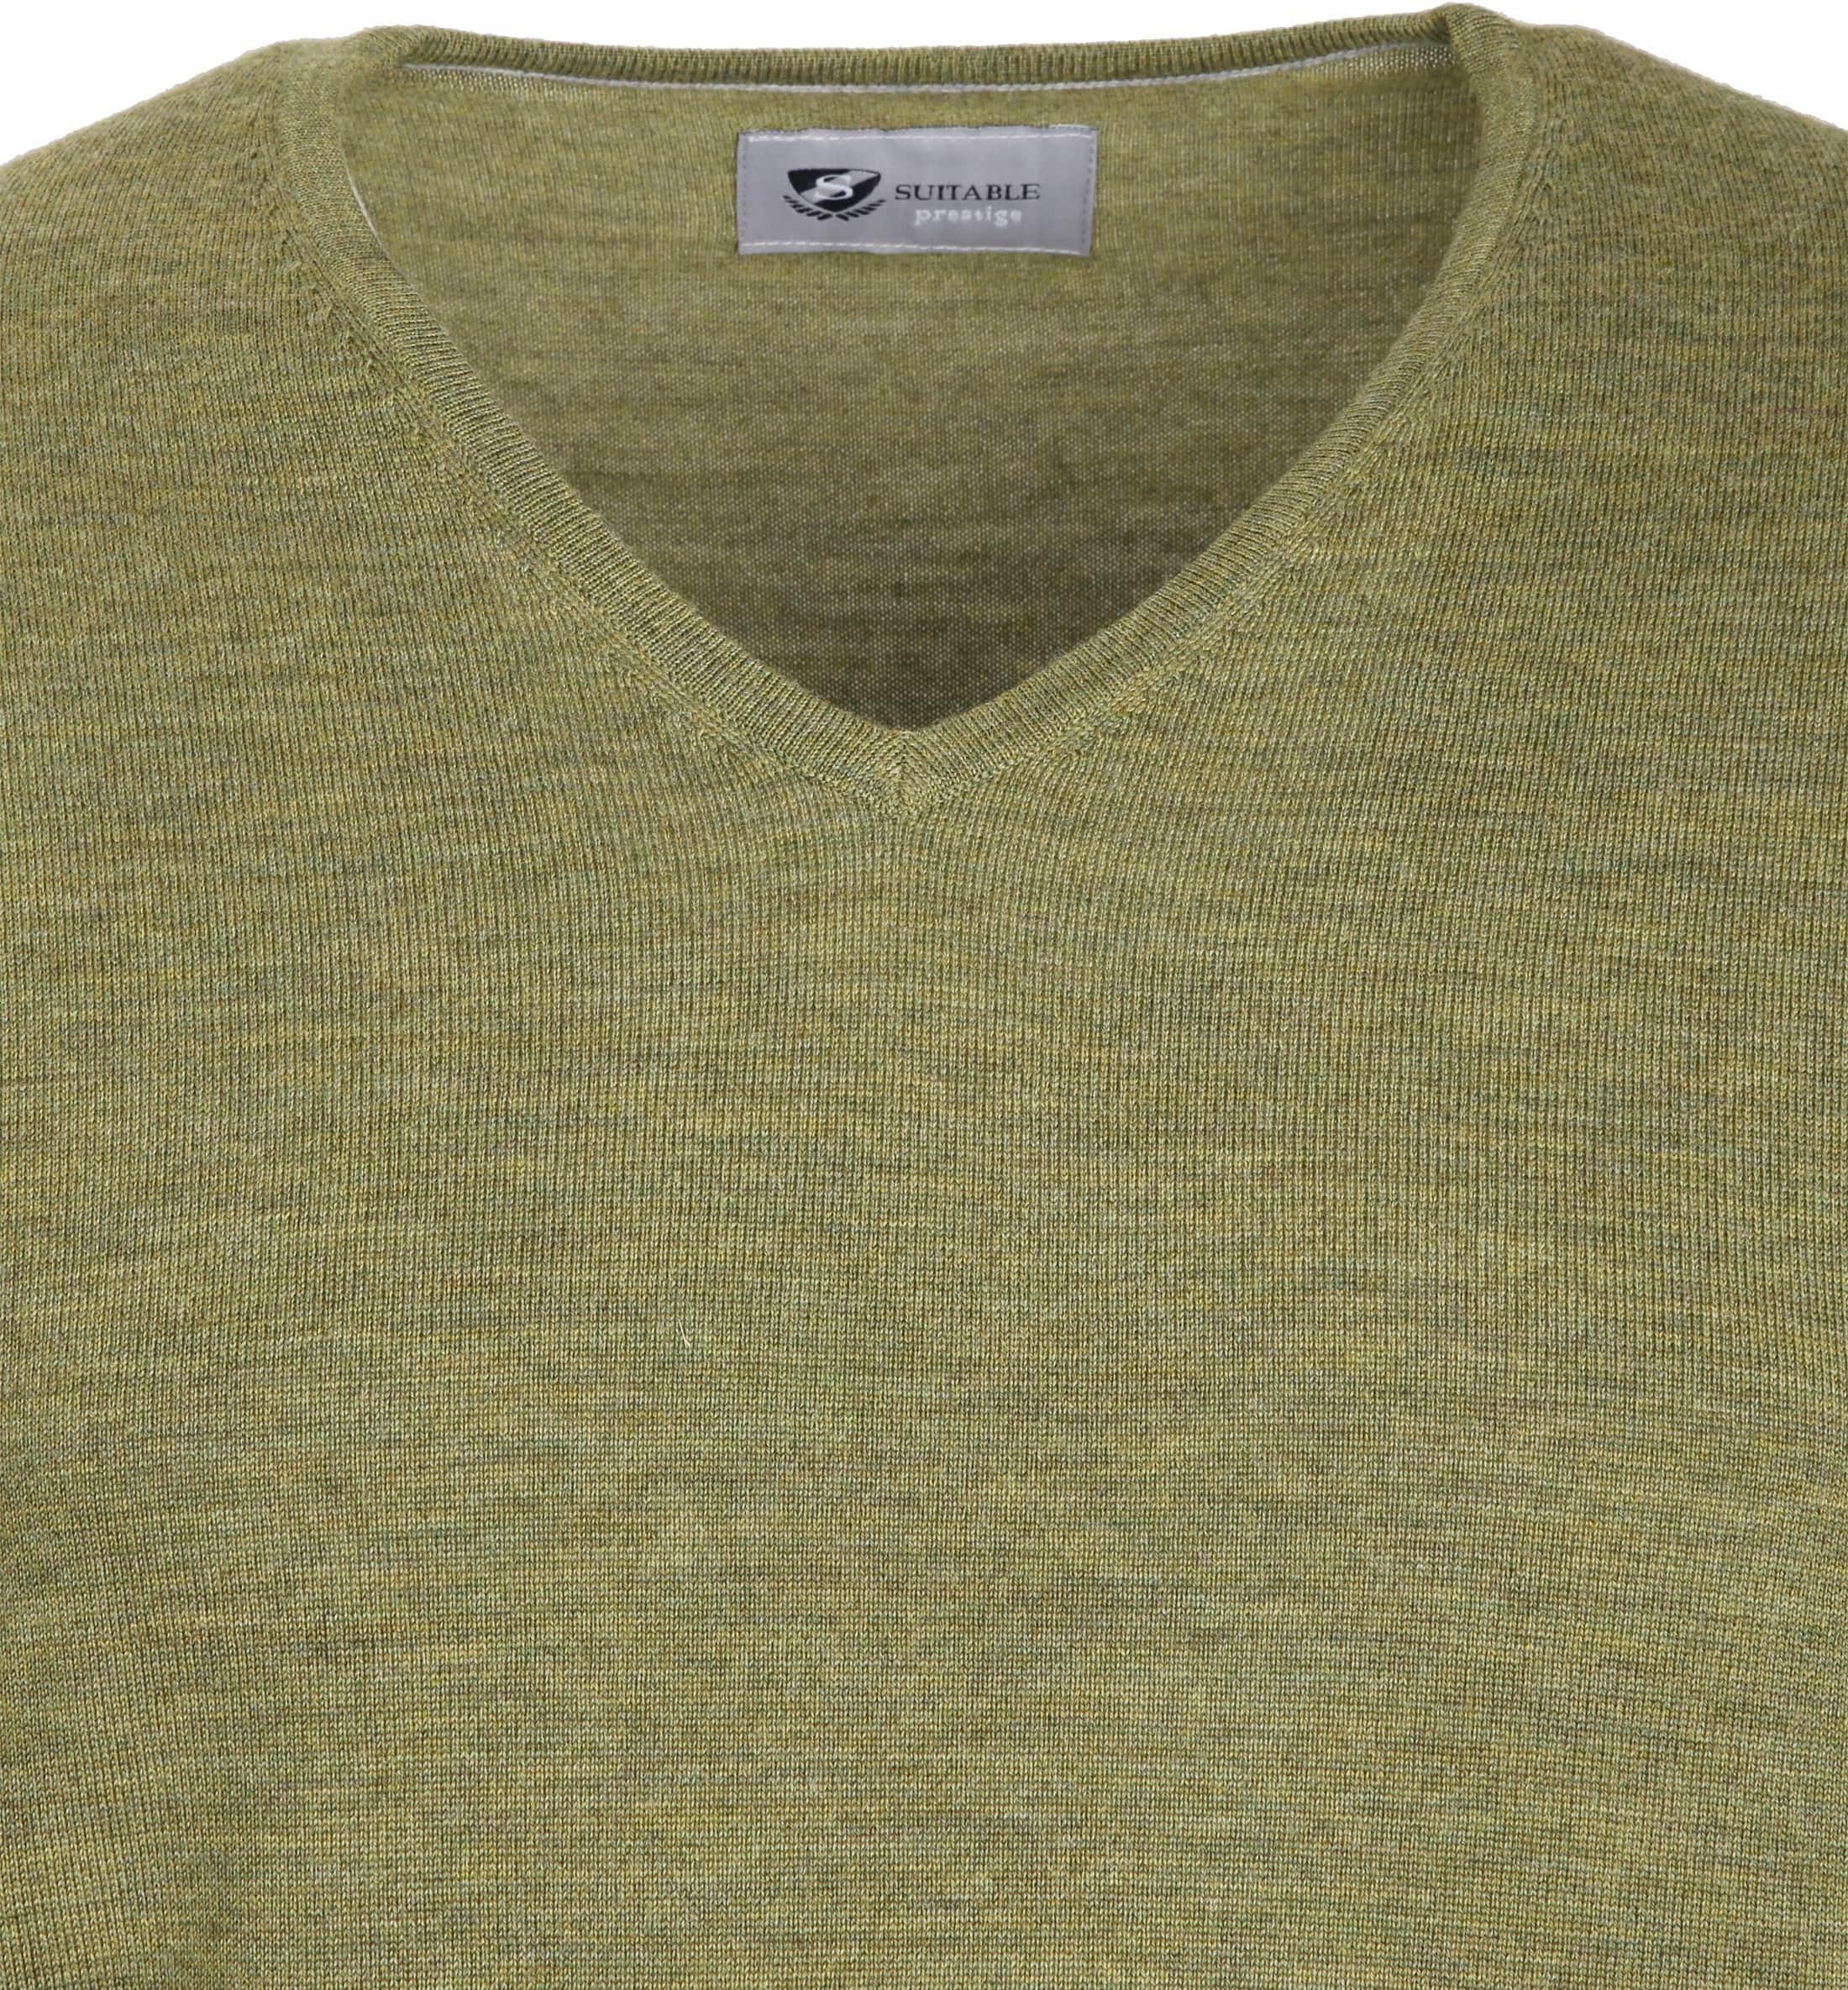 Suitable Prestige Pullover V-Ausschnitt Grün foto 1